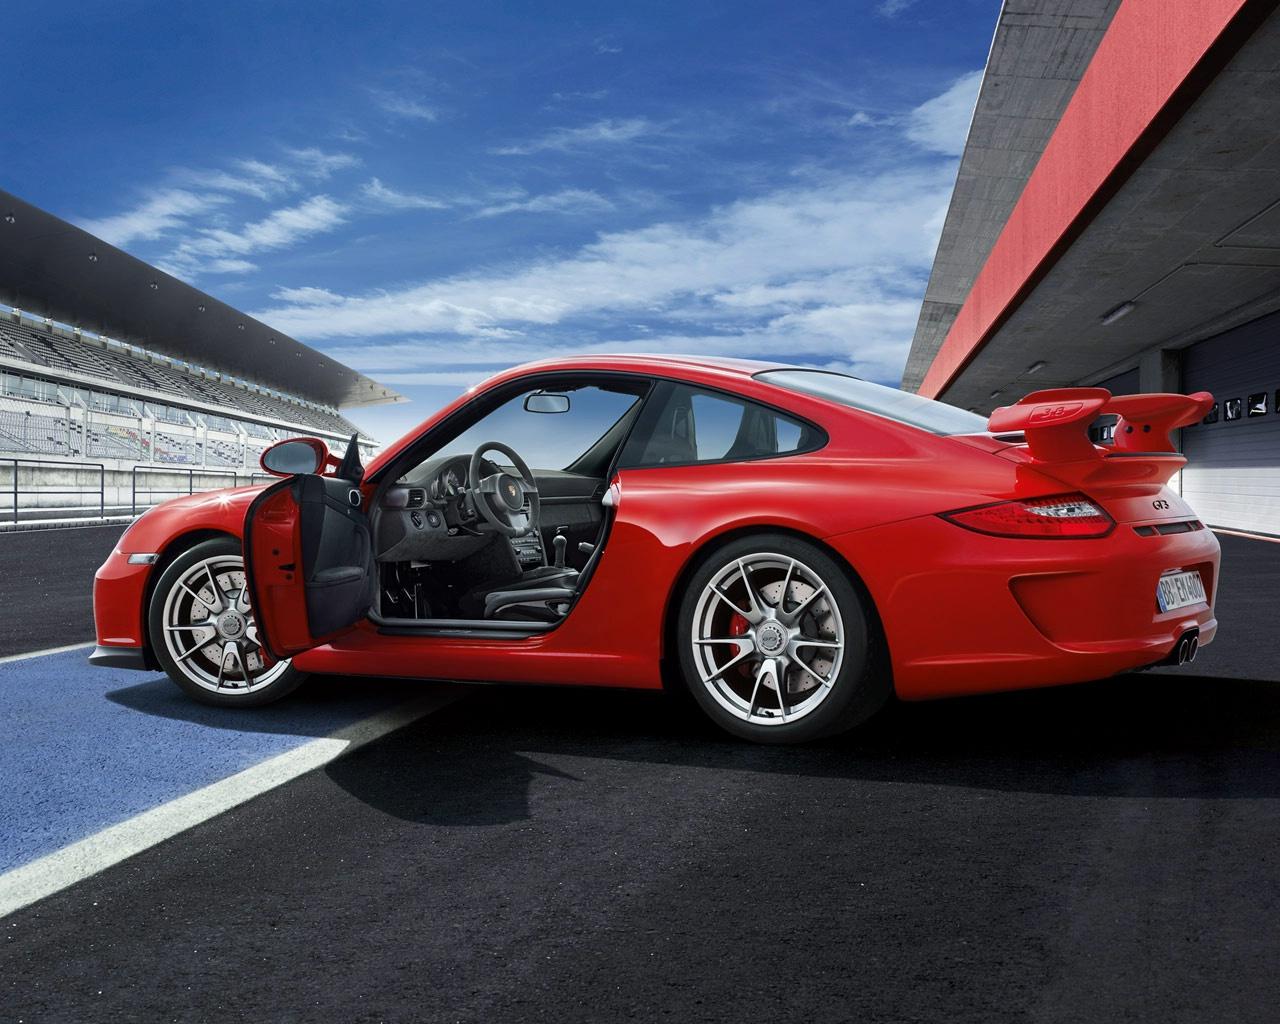 Porsche 911 GT3 View